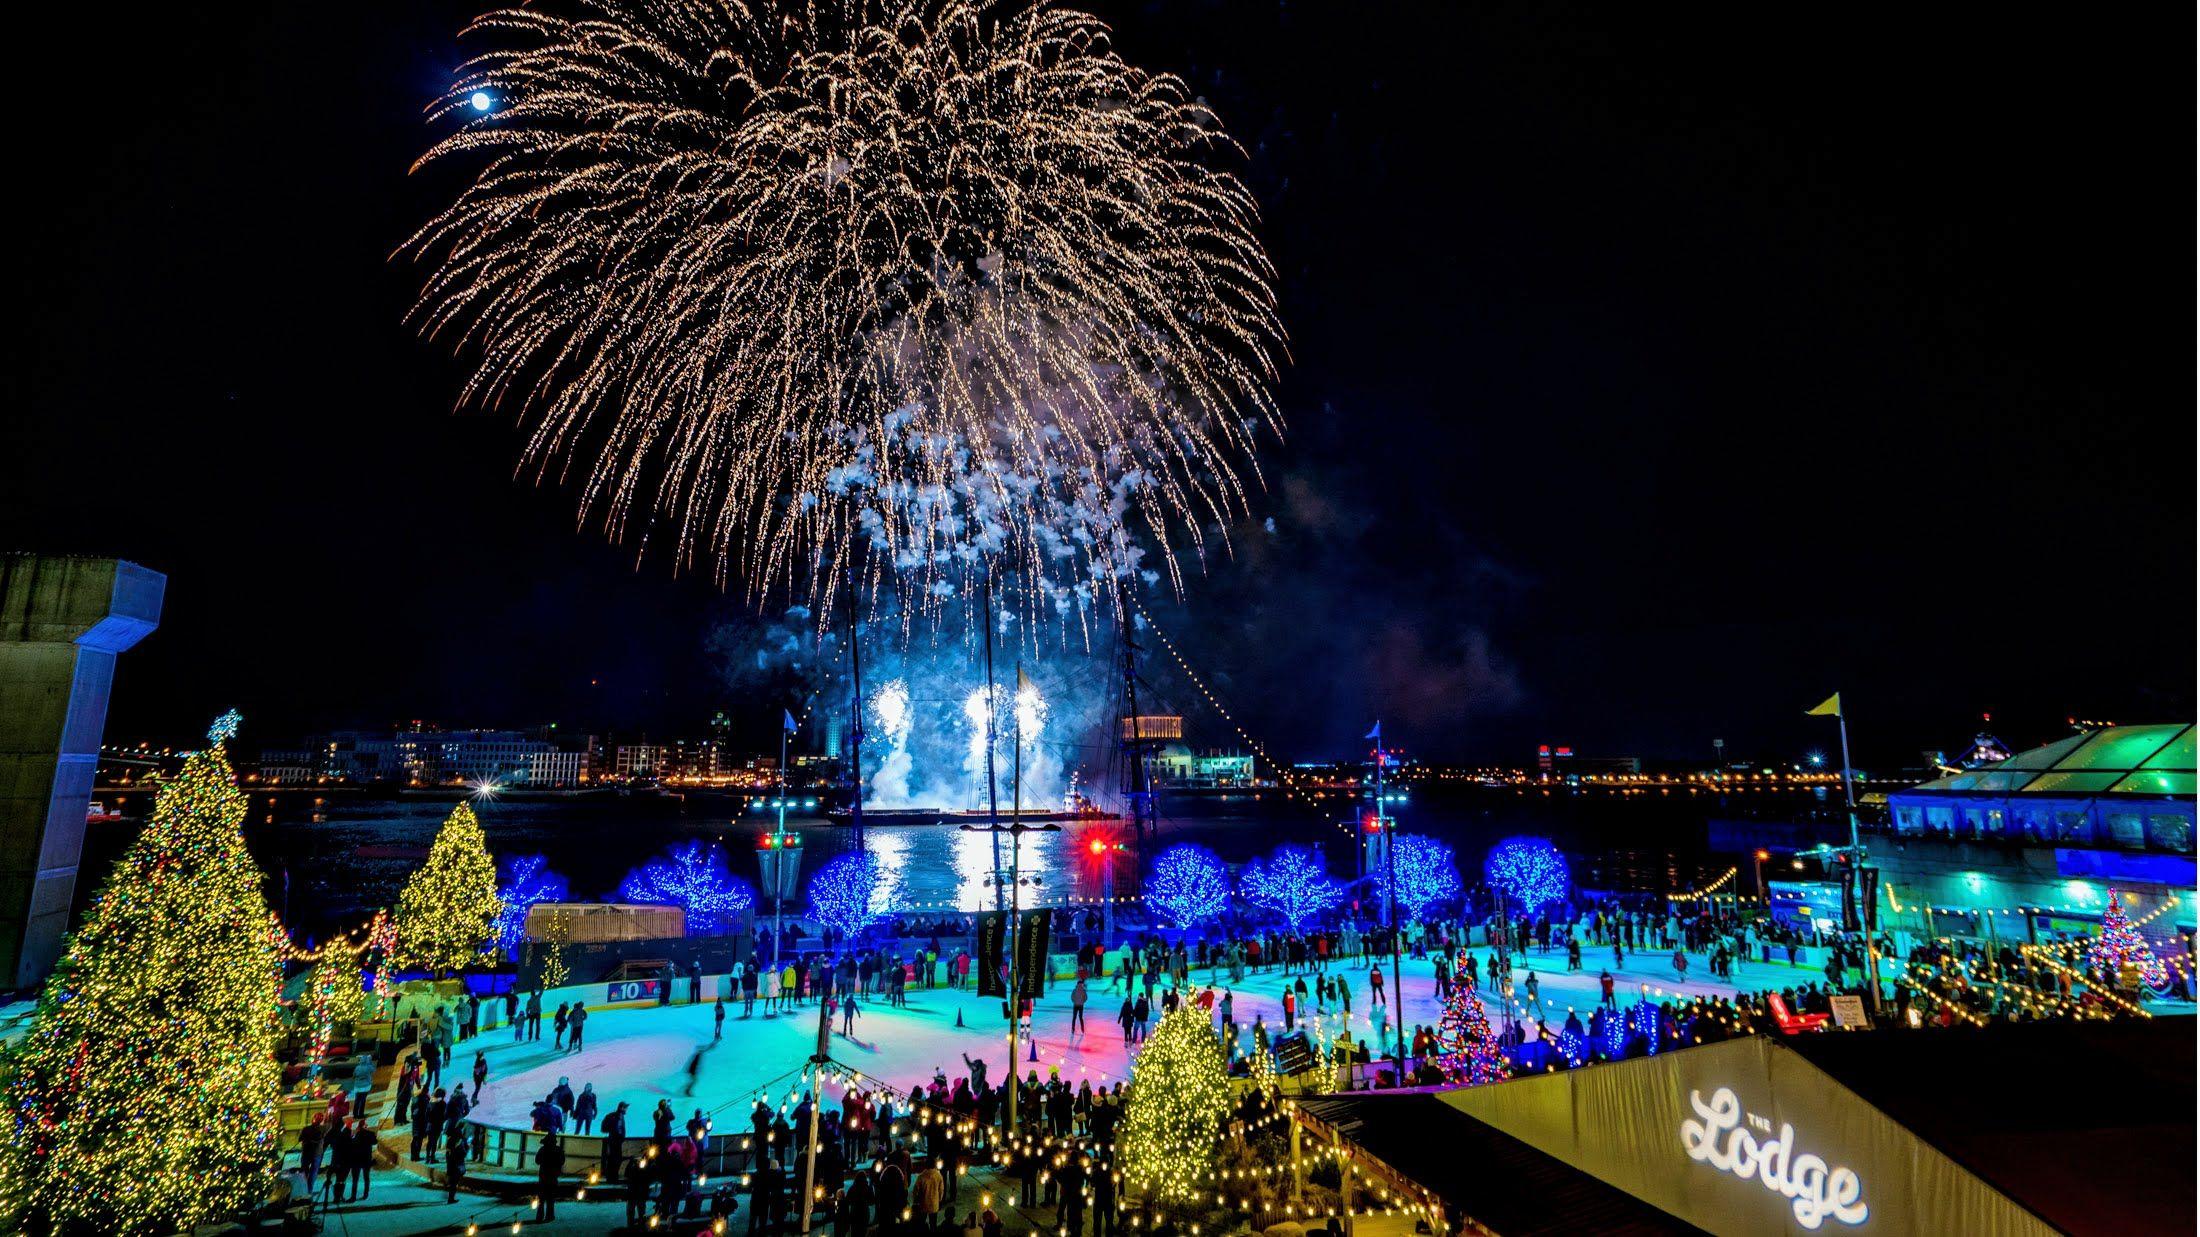 New Year S Eve Fireworks In Philadelphia New Years Eve Fireworks Columbus Day Weekend Visit Philadelphia